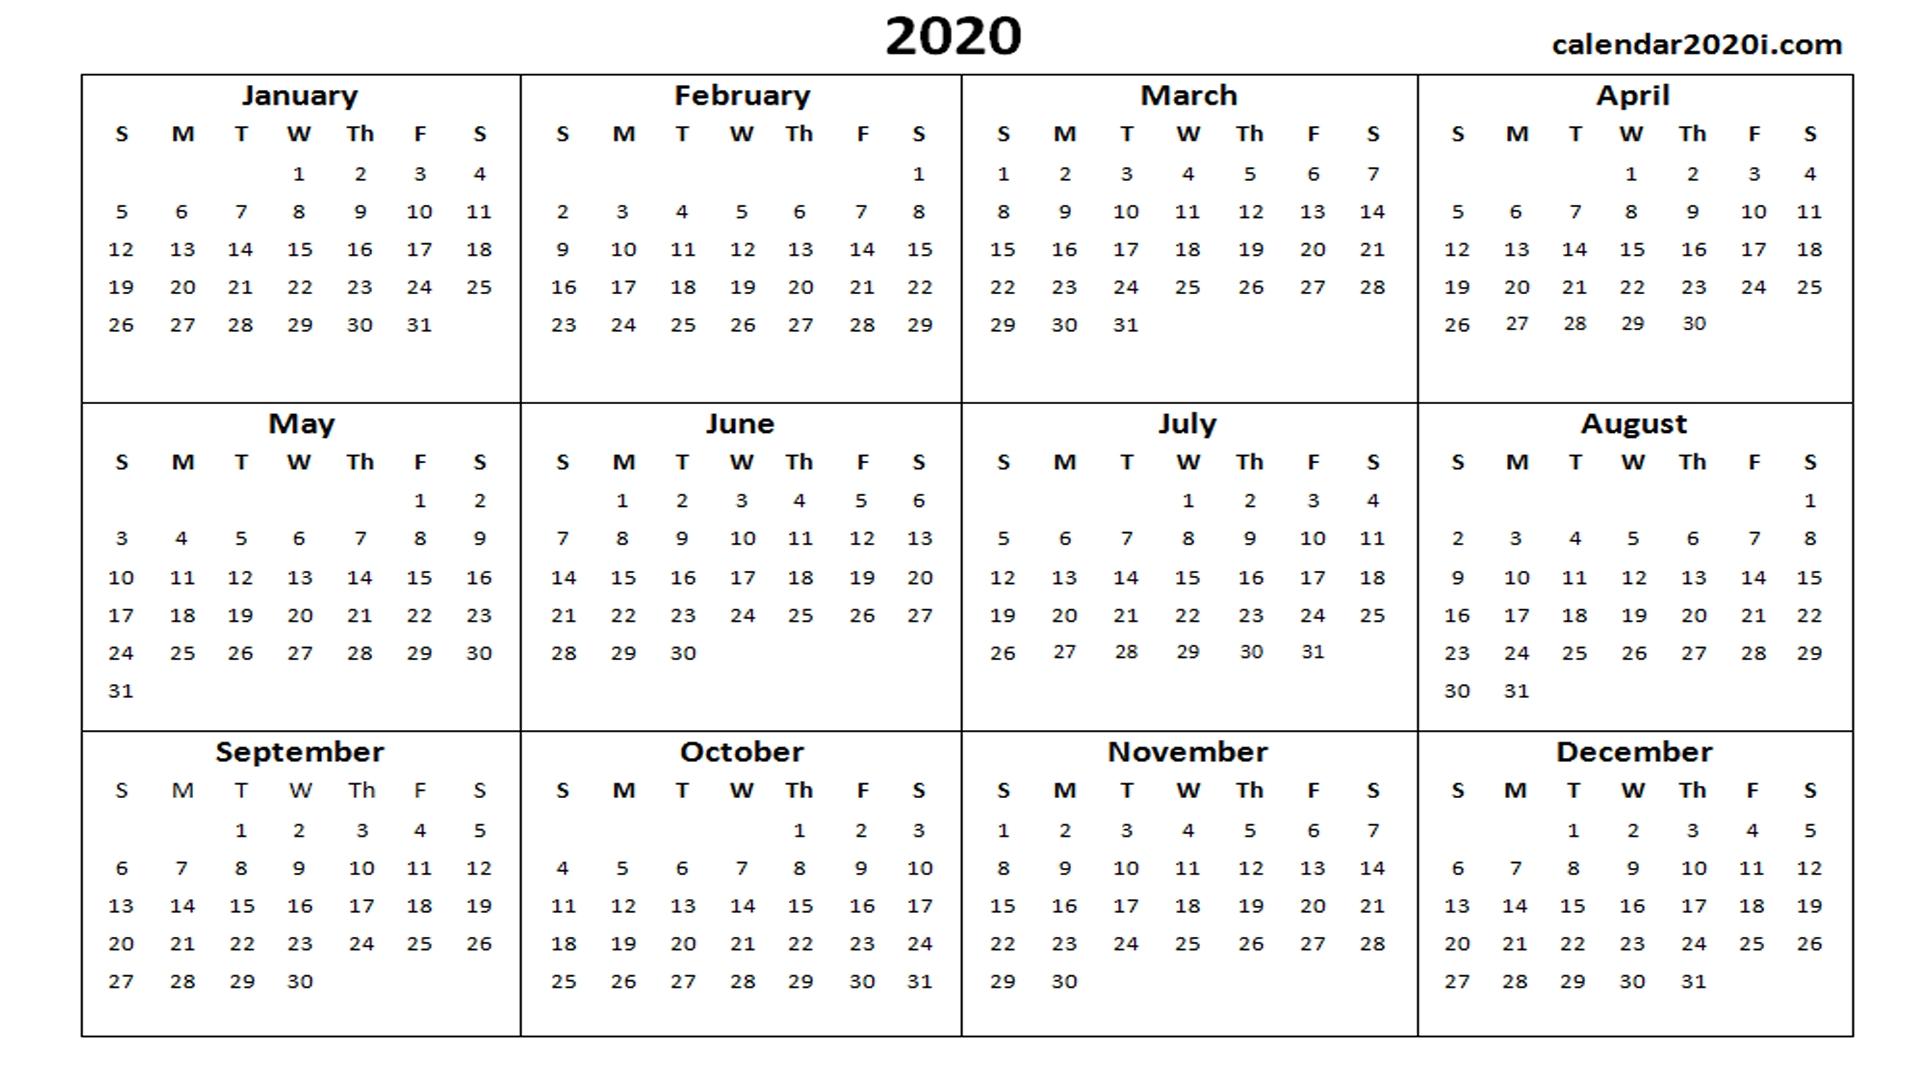 2020 Calendar Printable Template Holidays, Word, Excel, Pdf-2020 Printable Microsoft Word Calendar Template